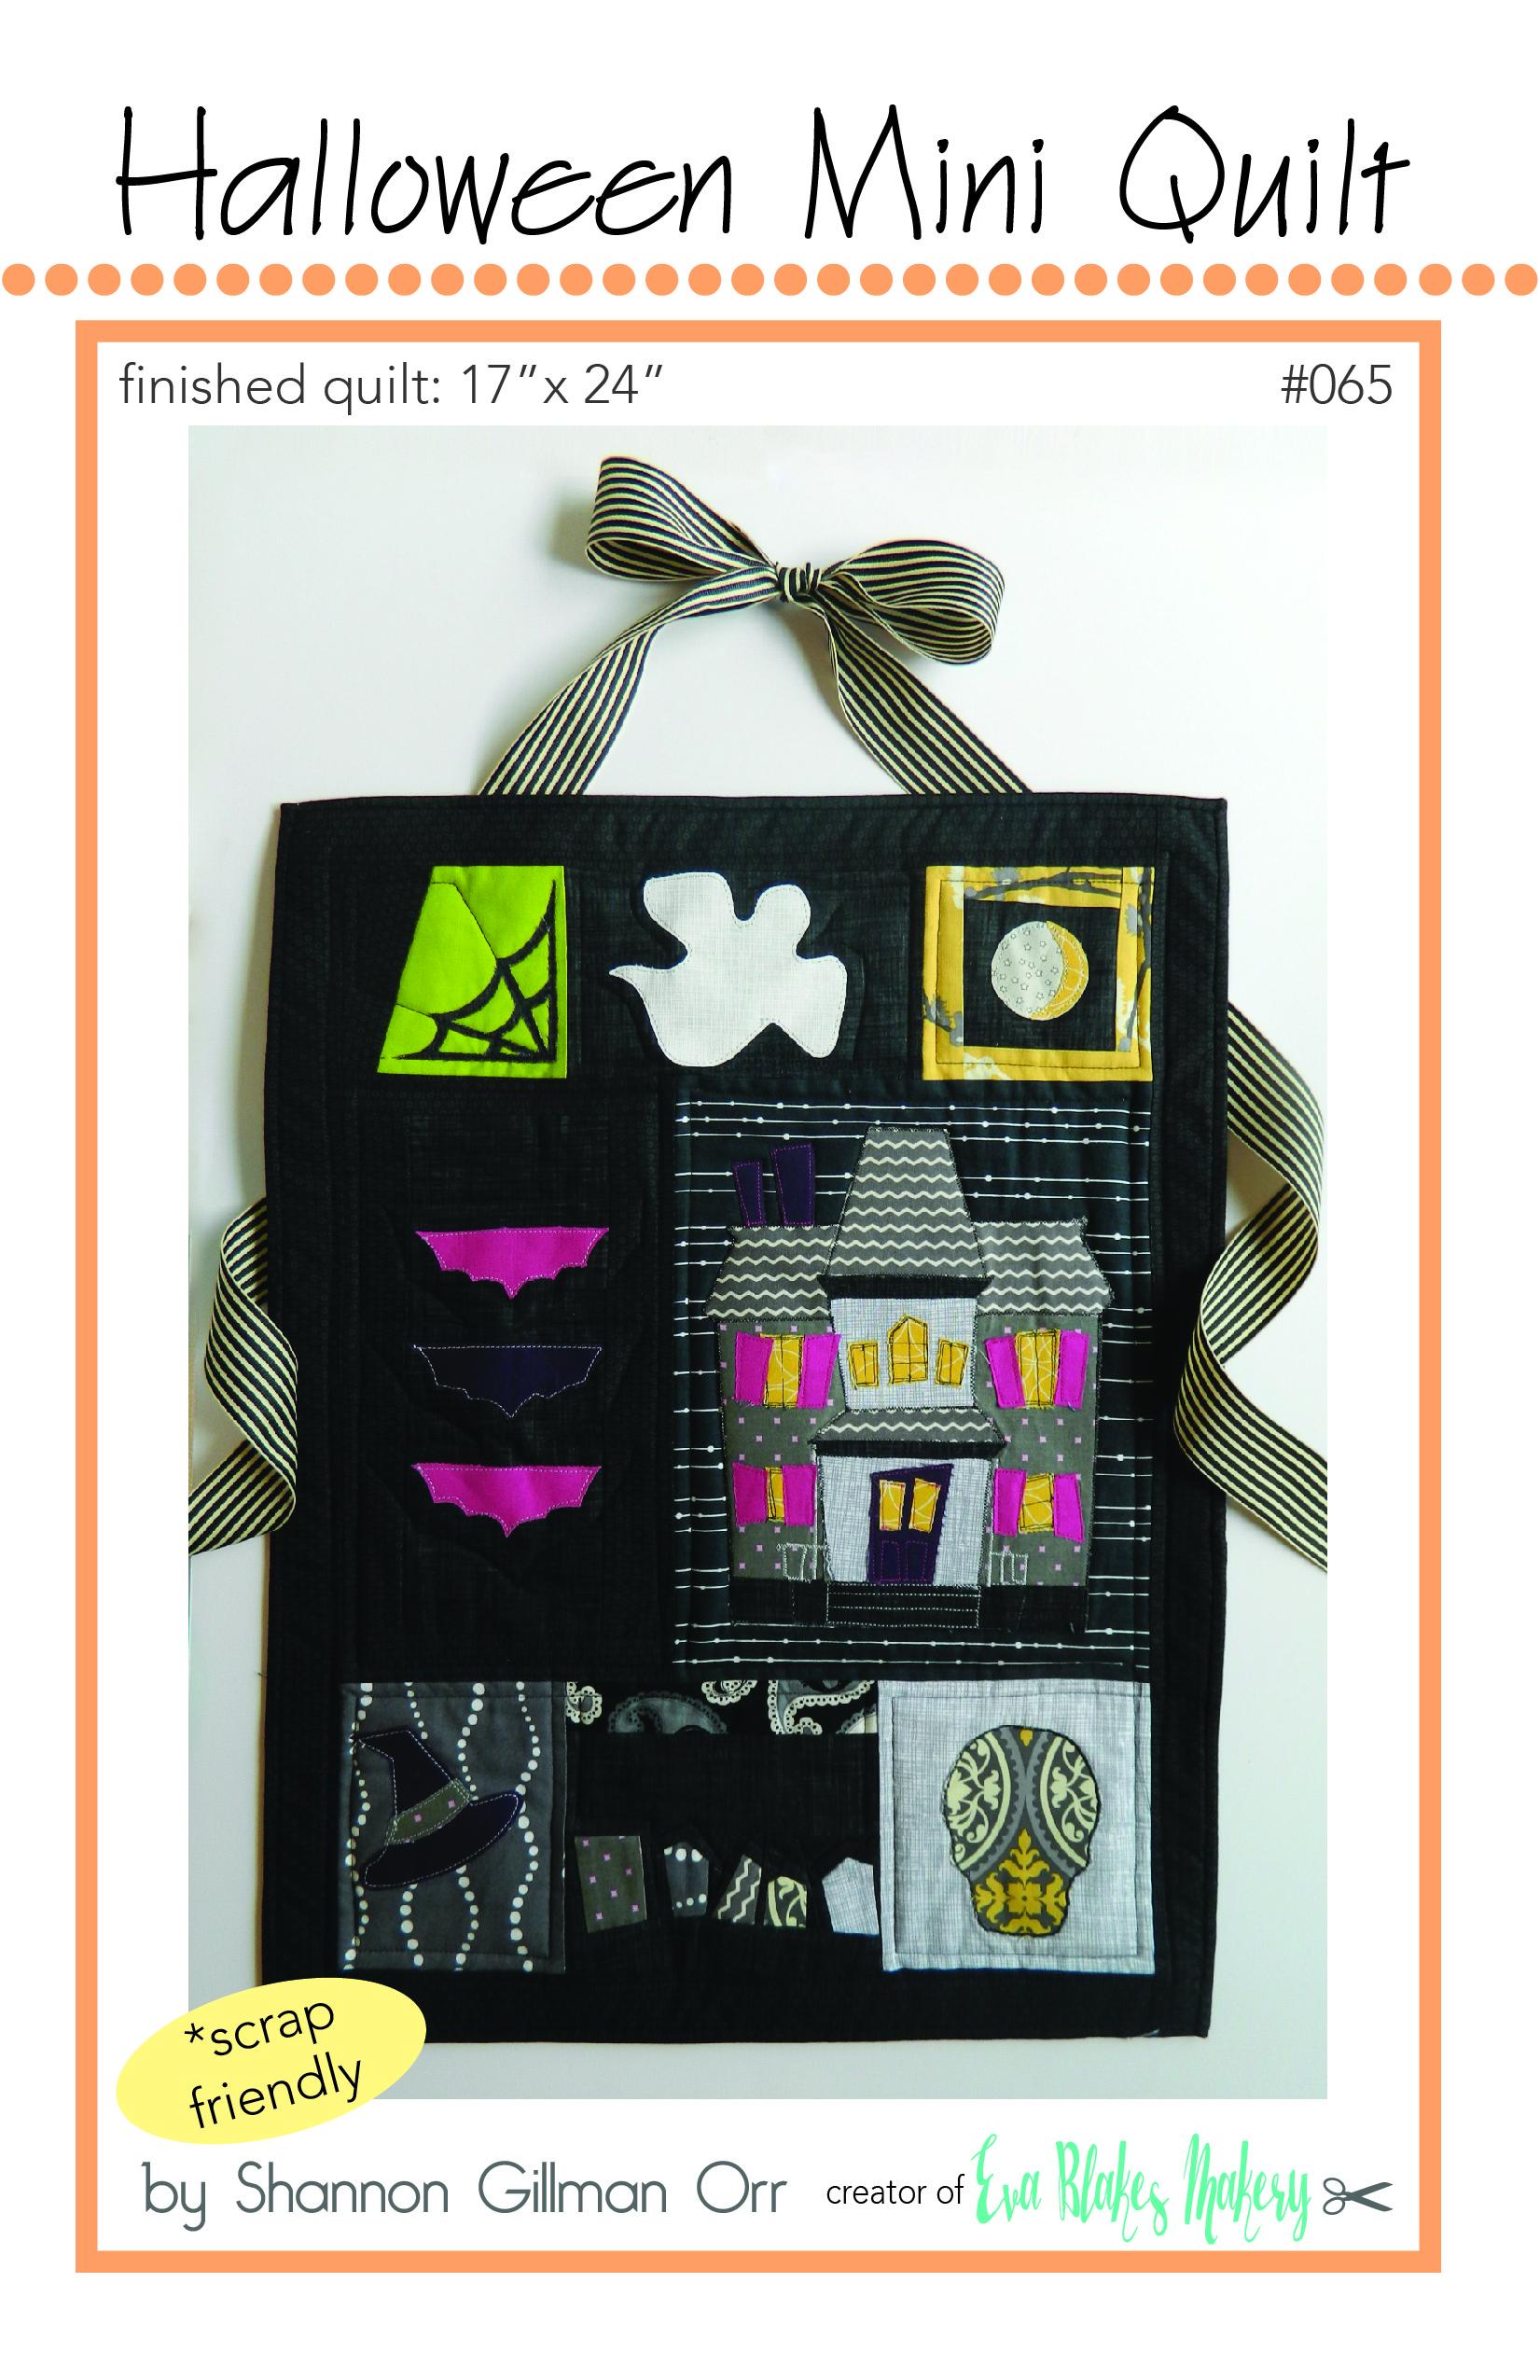 Halloween Mini Quilt Pattern 2 Cover-01.jpg